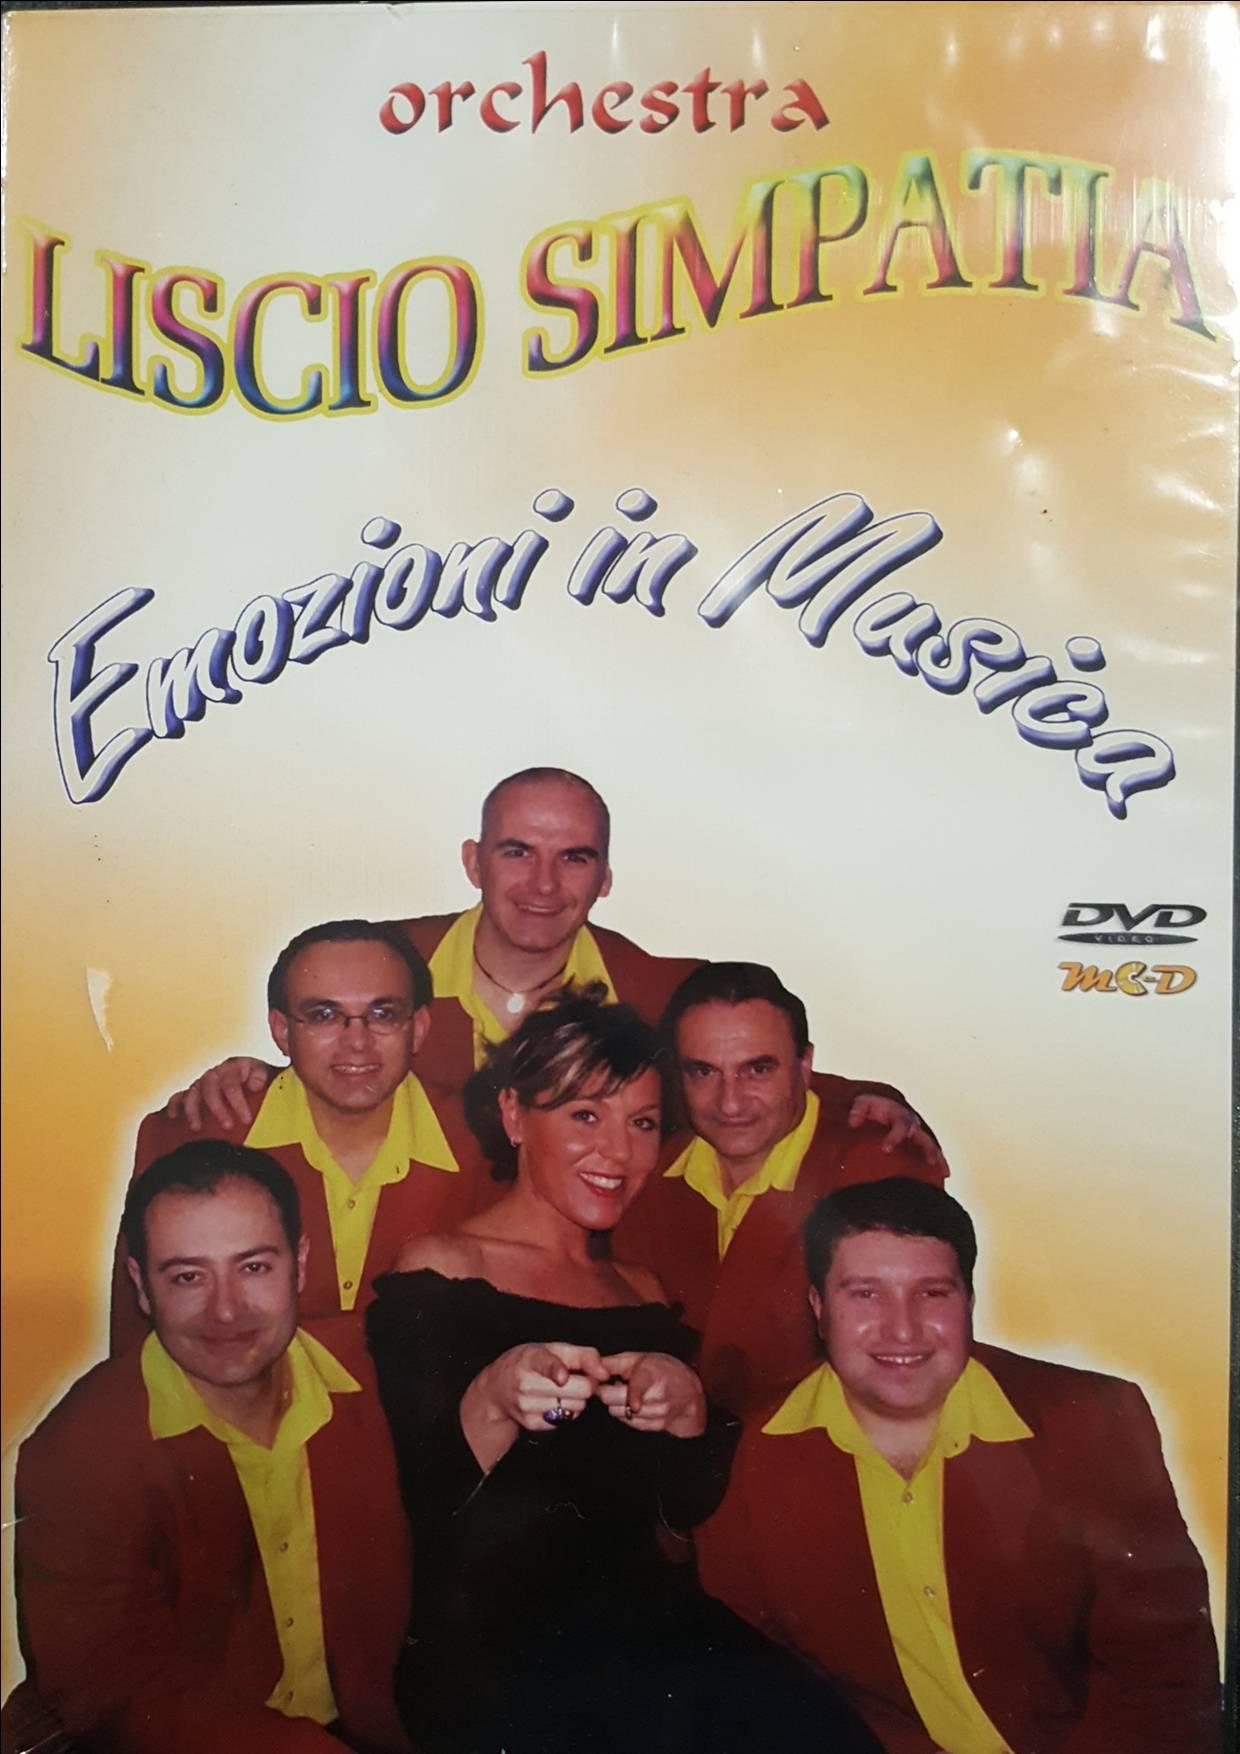 Calendario Orchestre Liscio.Orchestra Liscio Simpatia Emozioni In Musica Dvd